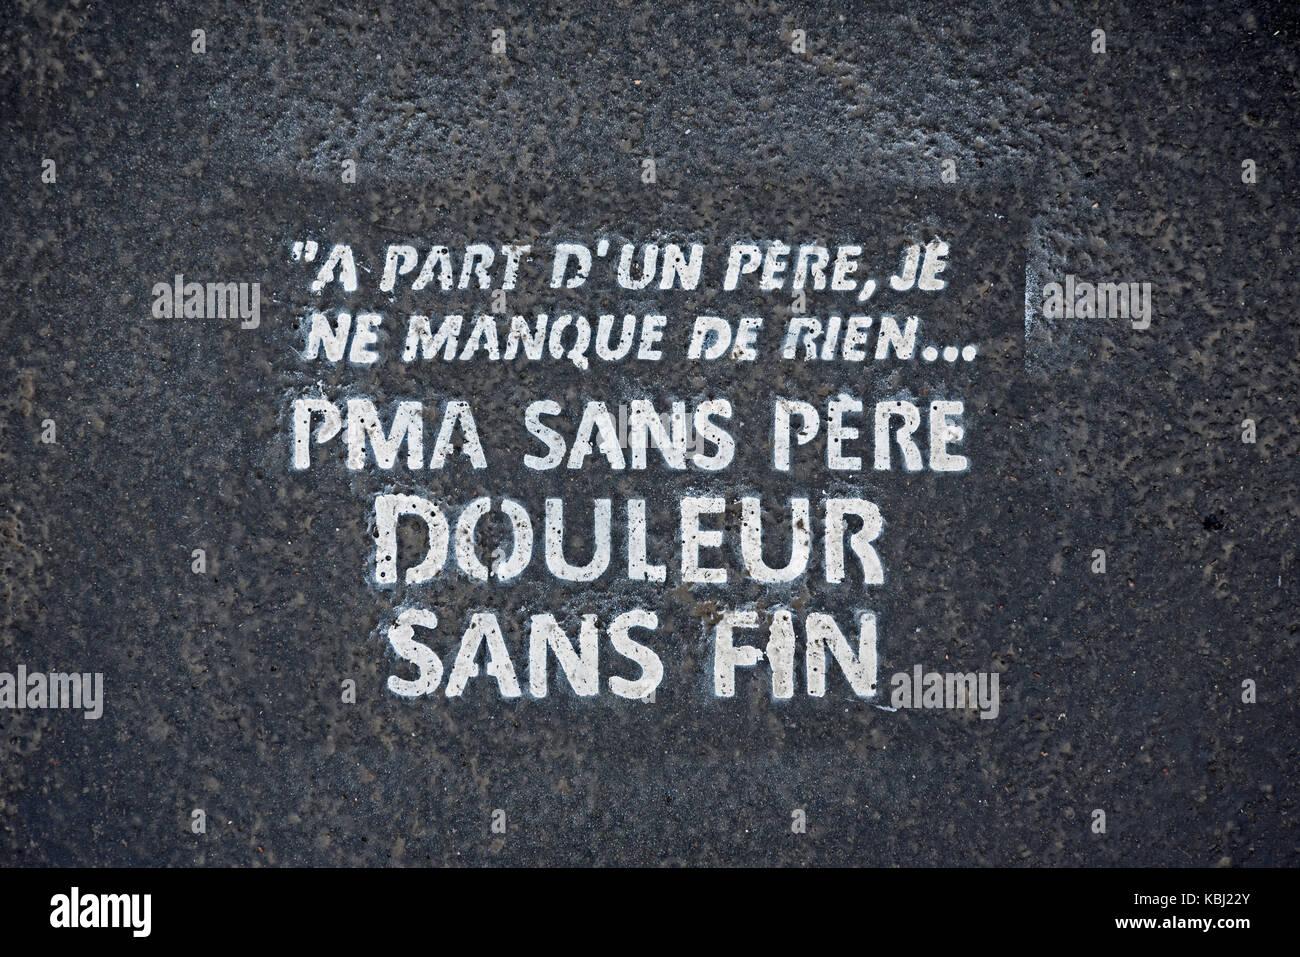 'PMA Sans pere' stencil on a pavement in Paris, France. - Stock Image